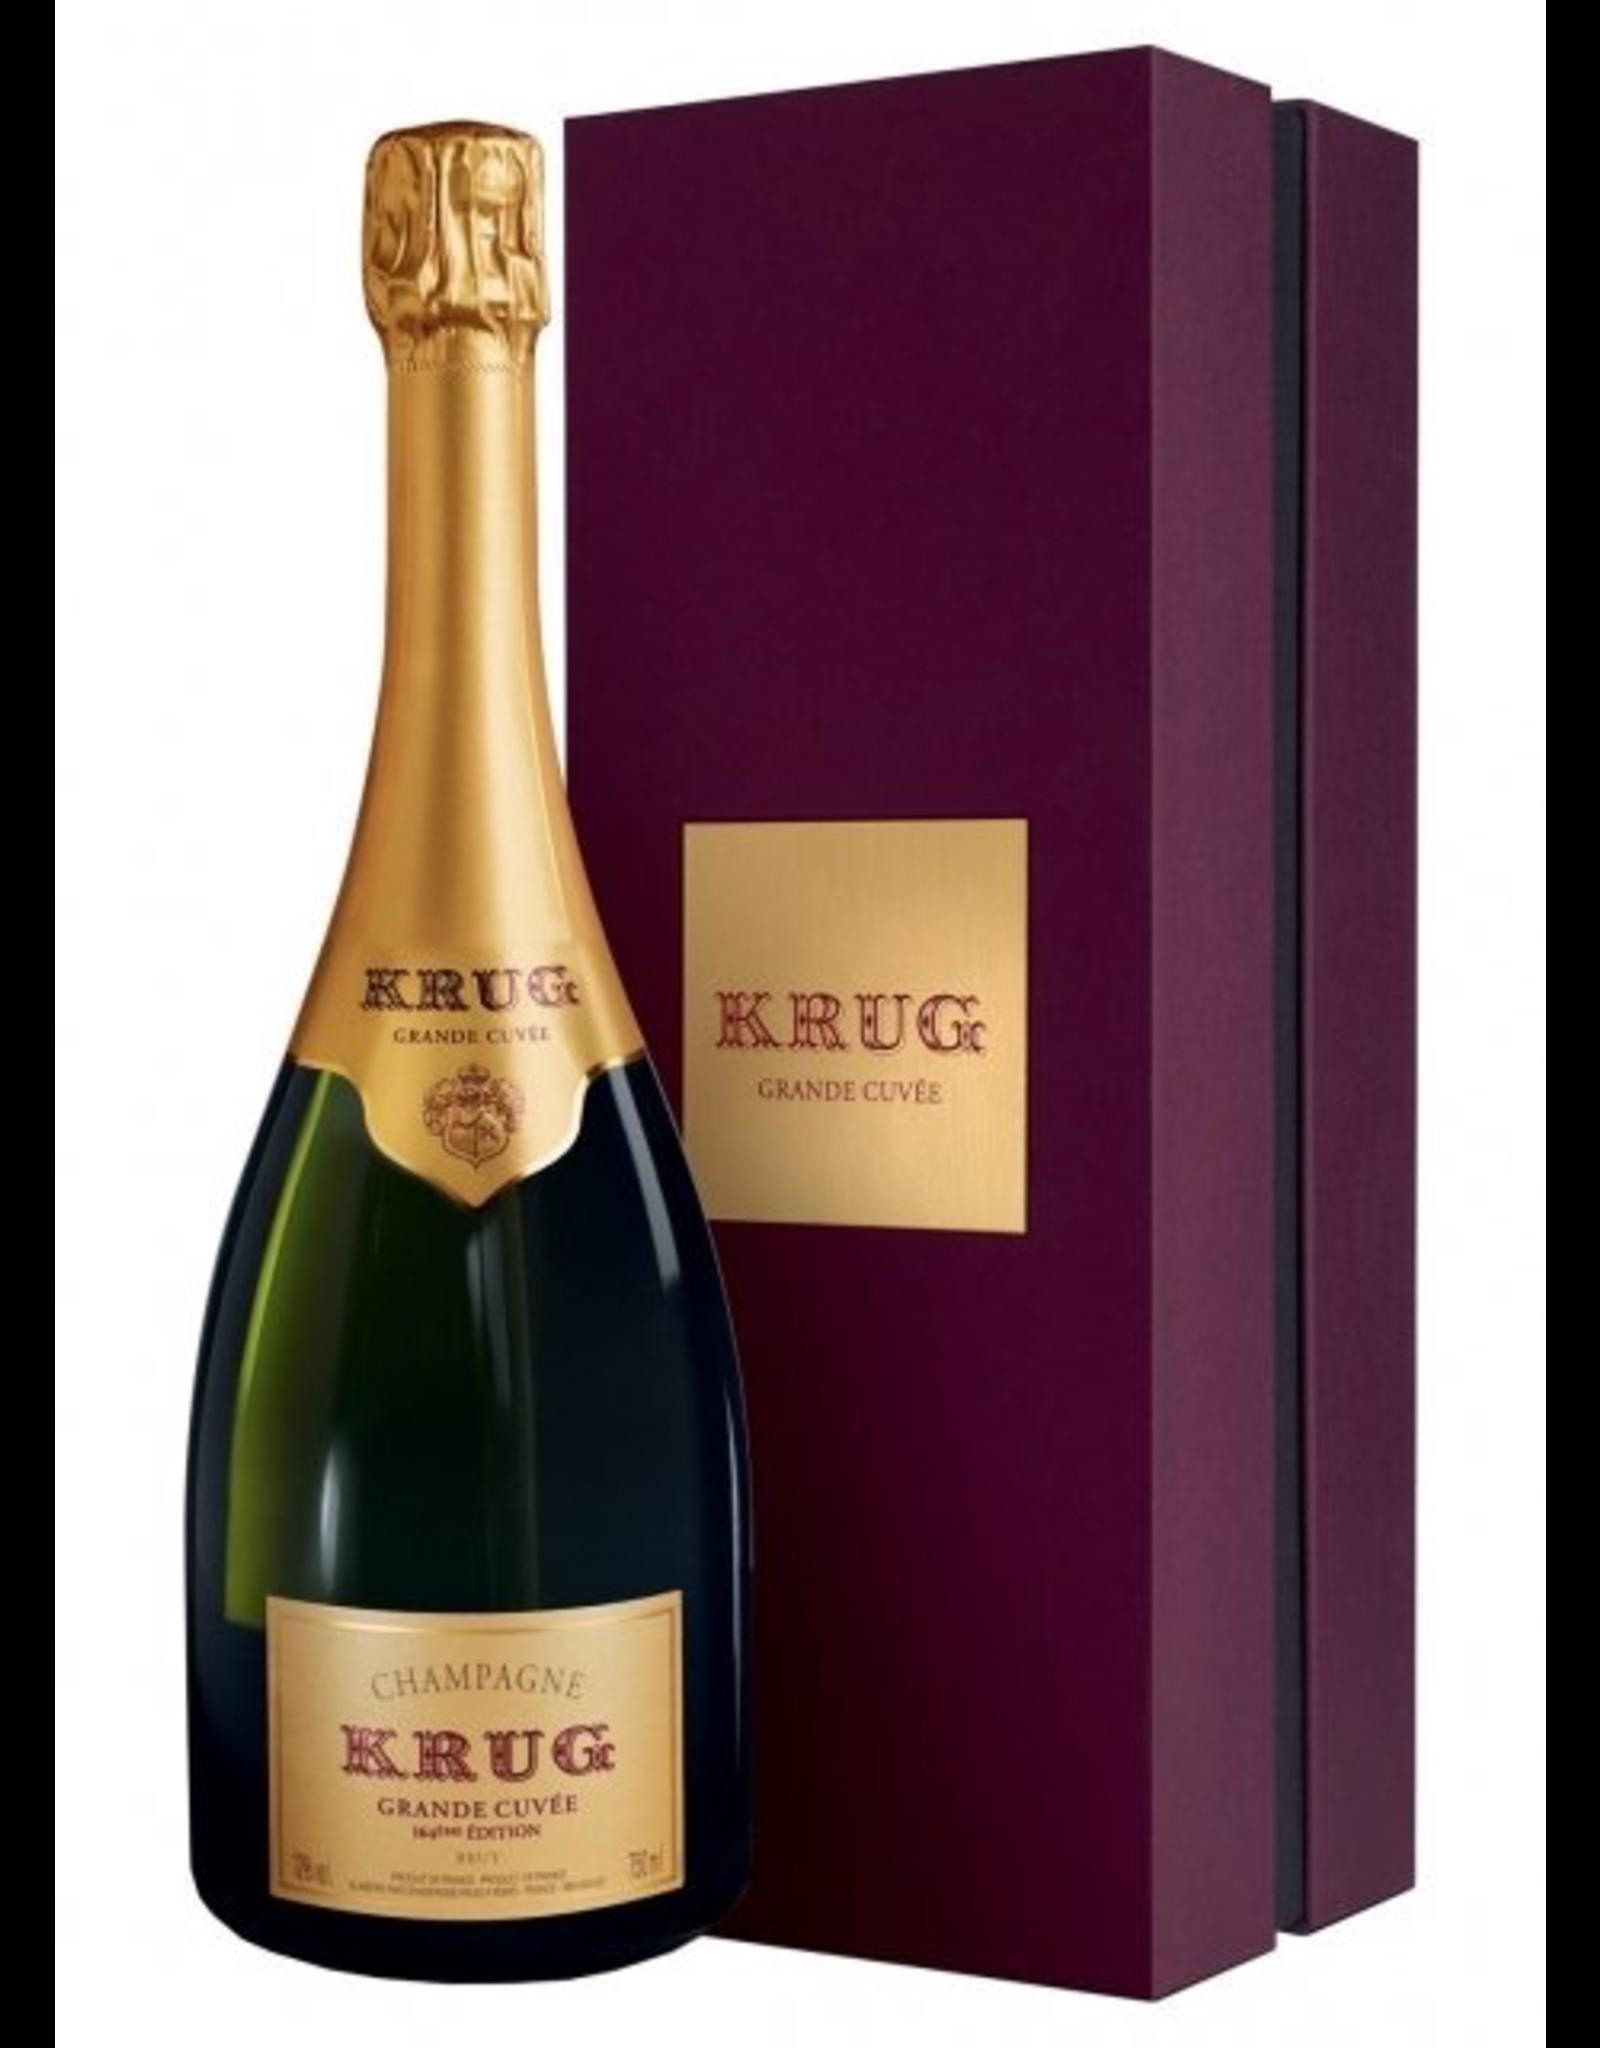 Sparkling Wine NV, Krug 167th Edition Grand Cuvee GIFT BOX, Champagne, Reims, Champagne, France, 12% Alc, CTnr RP96